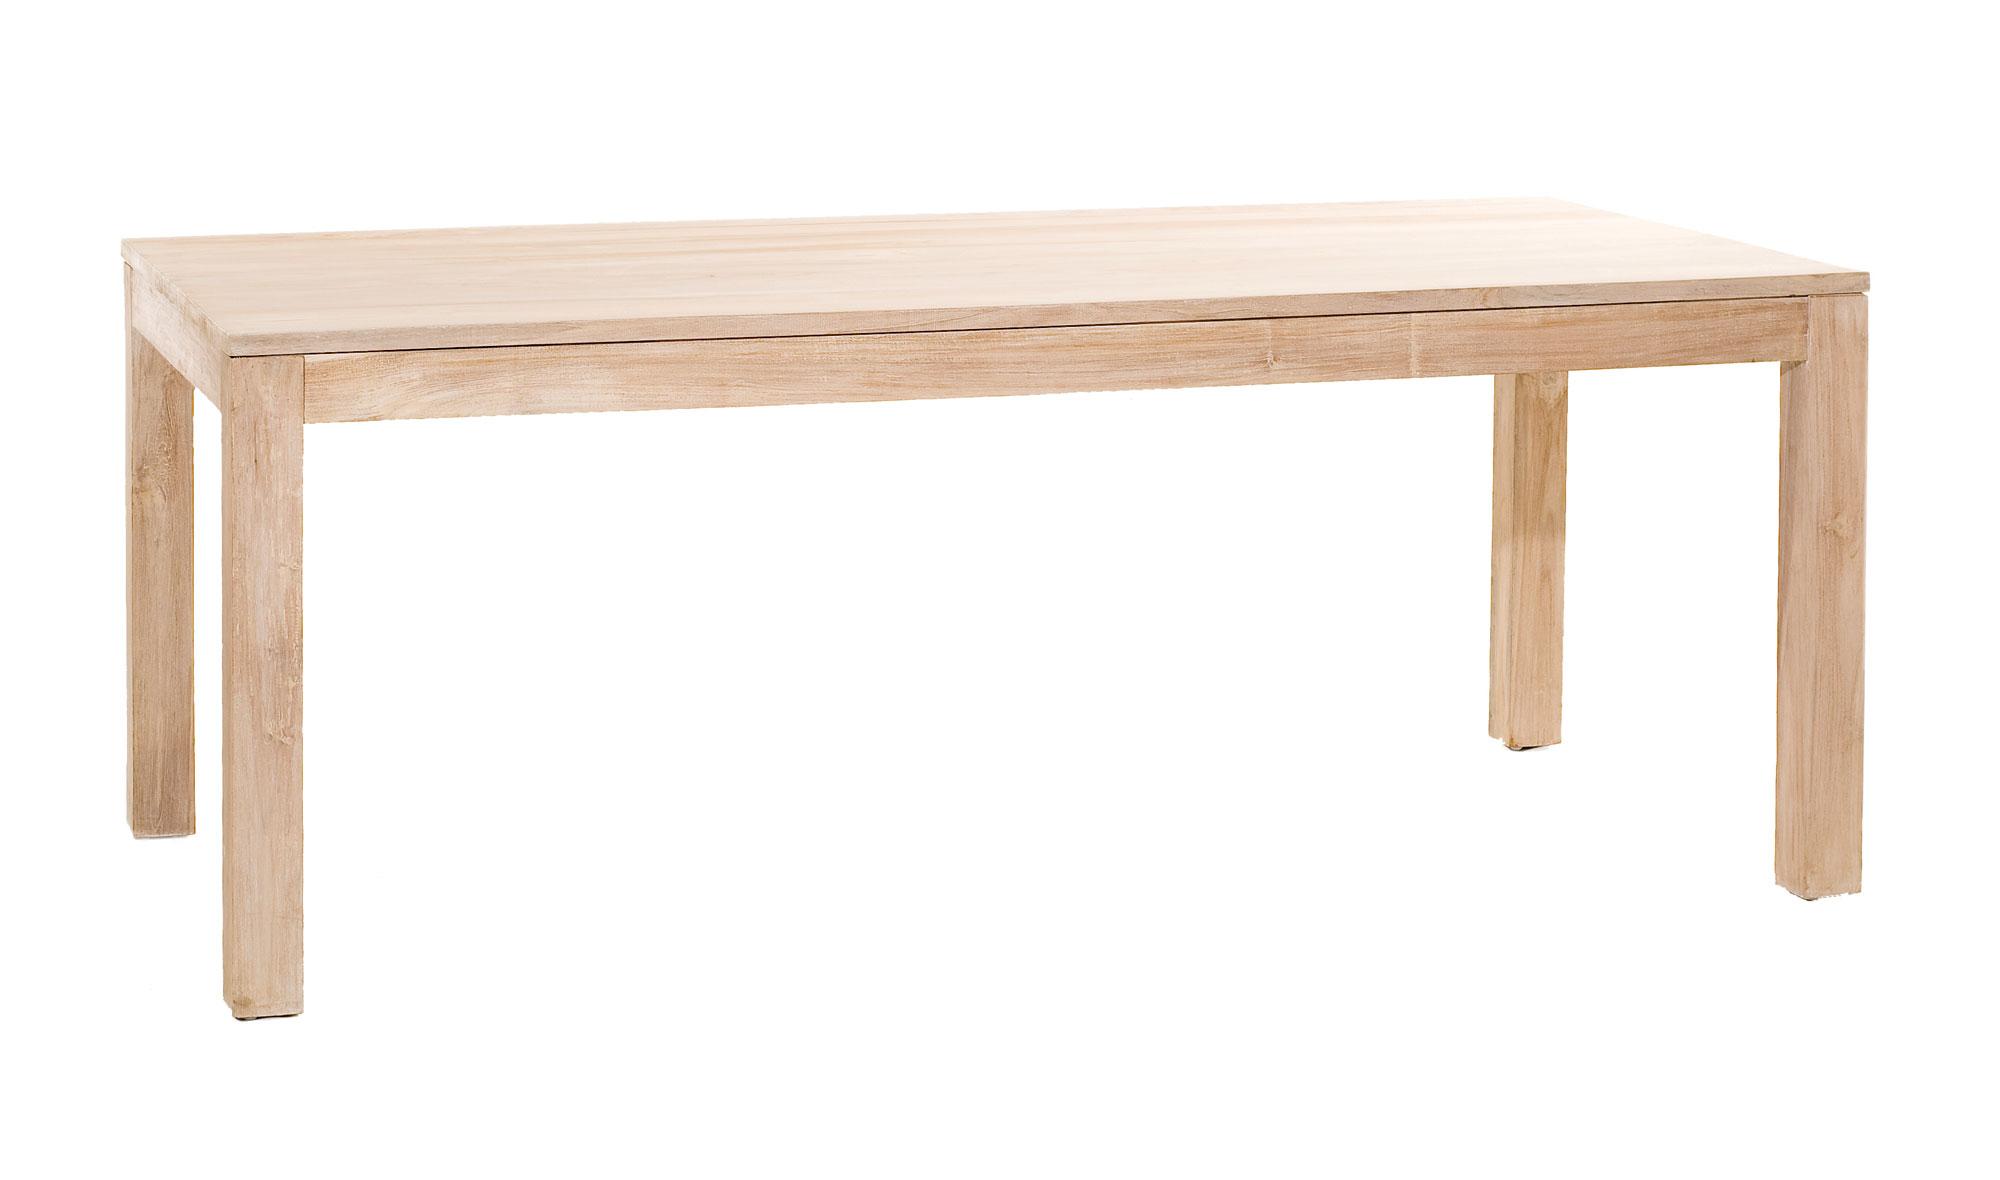 Mesa de comedor rectangular colonial madera lavada no - Mesa comedor colonial ...